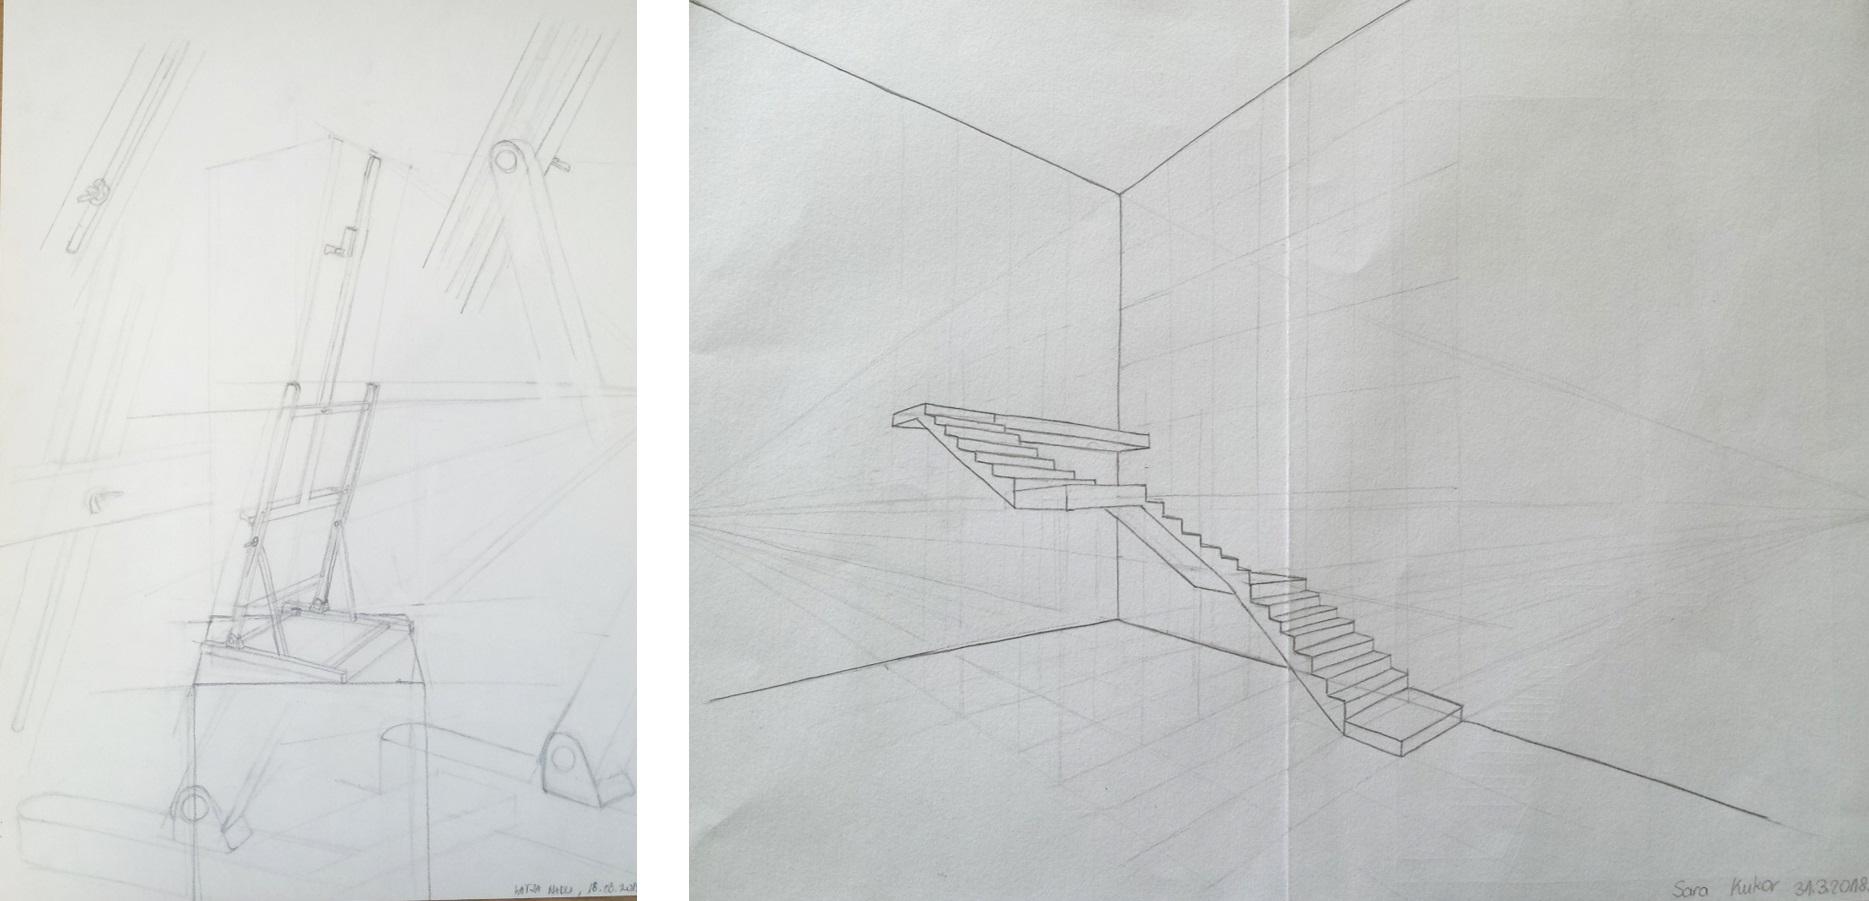 Pripreme Za Prijemni Arhitektura 2020 Drustvo Arhitekata Zagreba